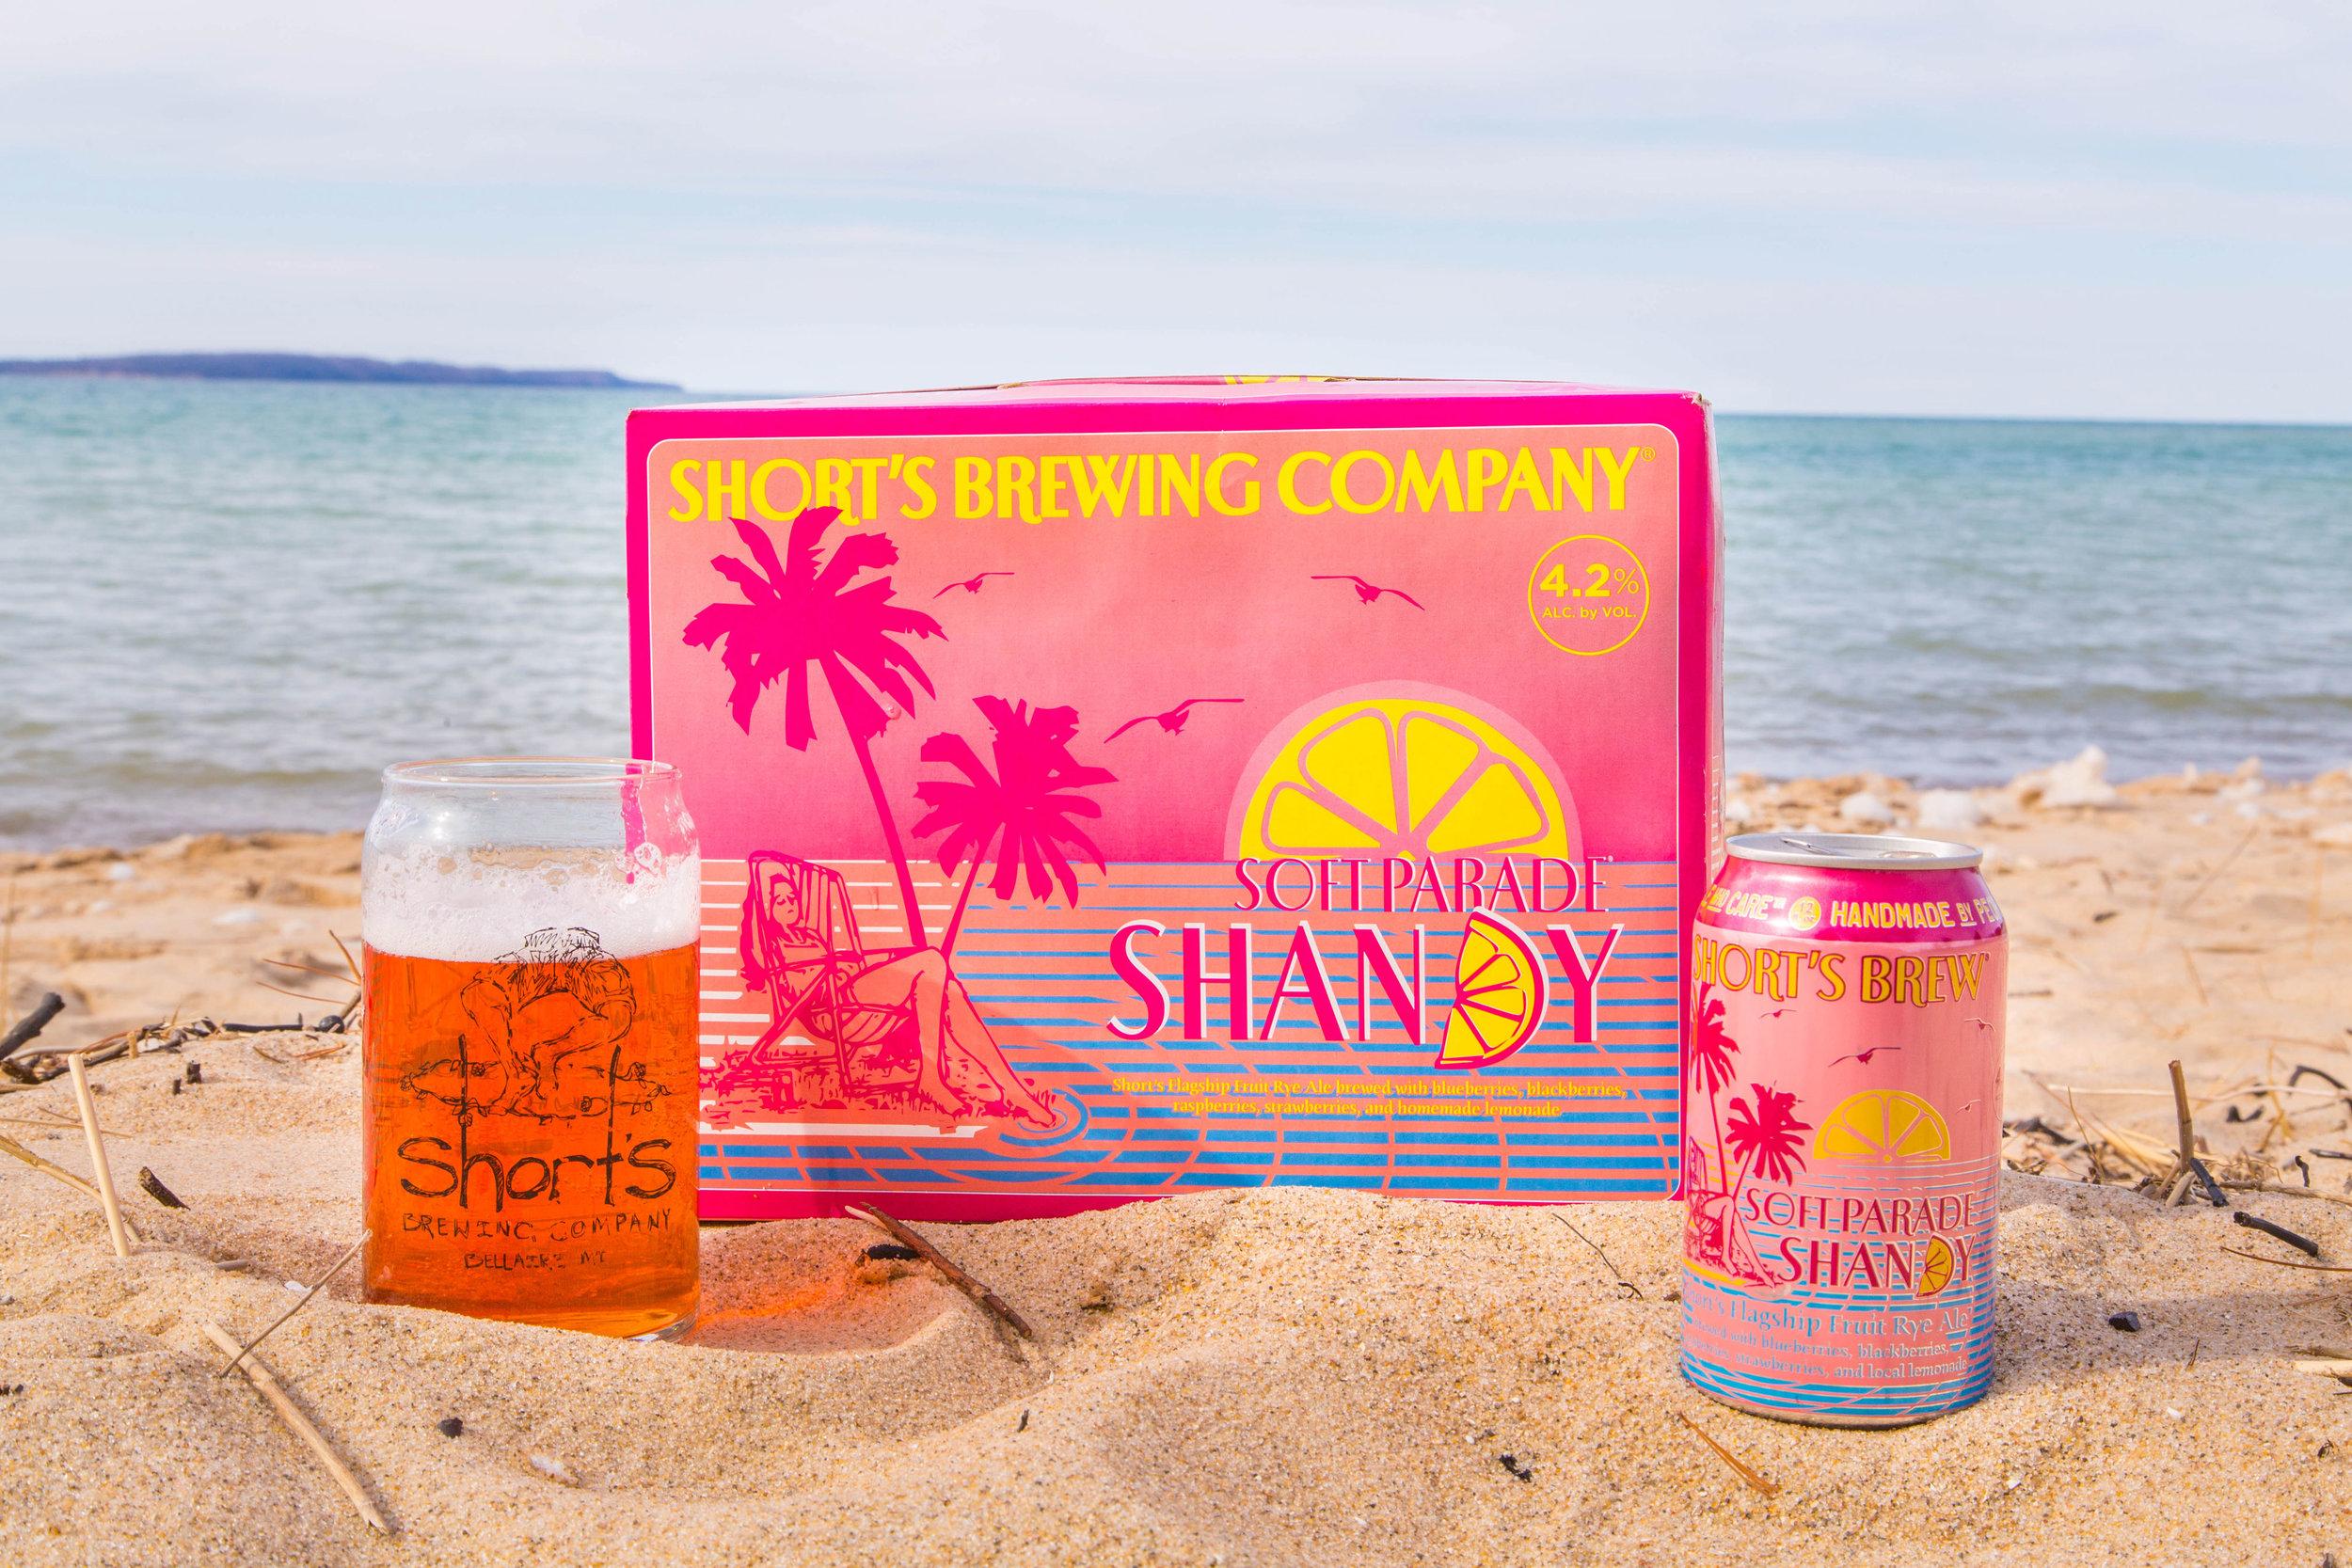 soft-parade-shandy_shorts-brewing-company.jpg